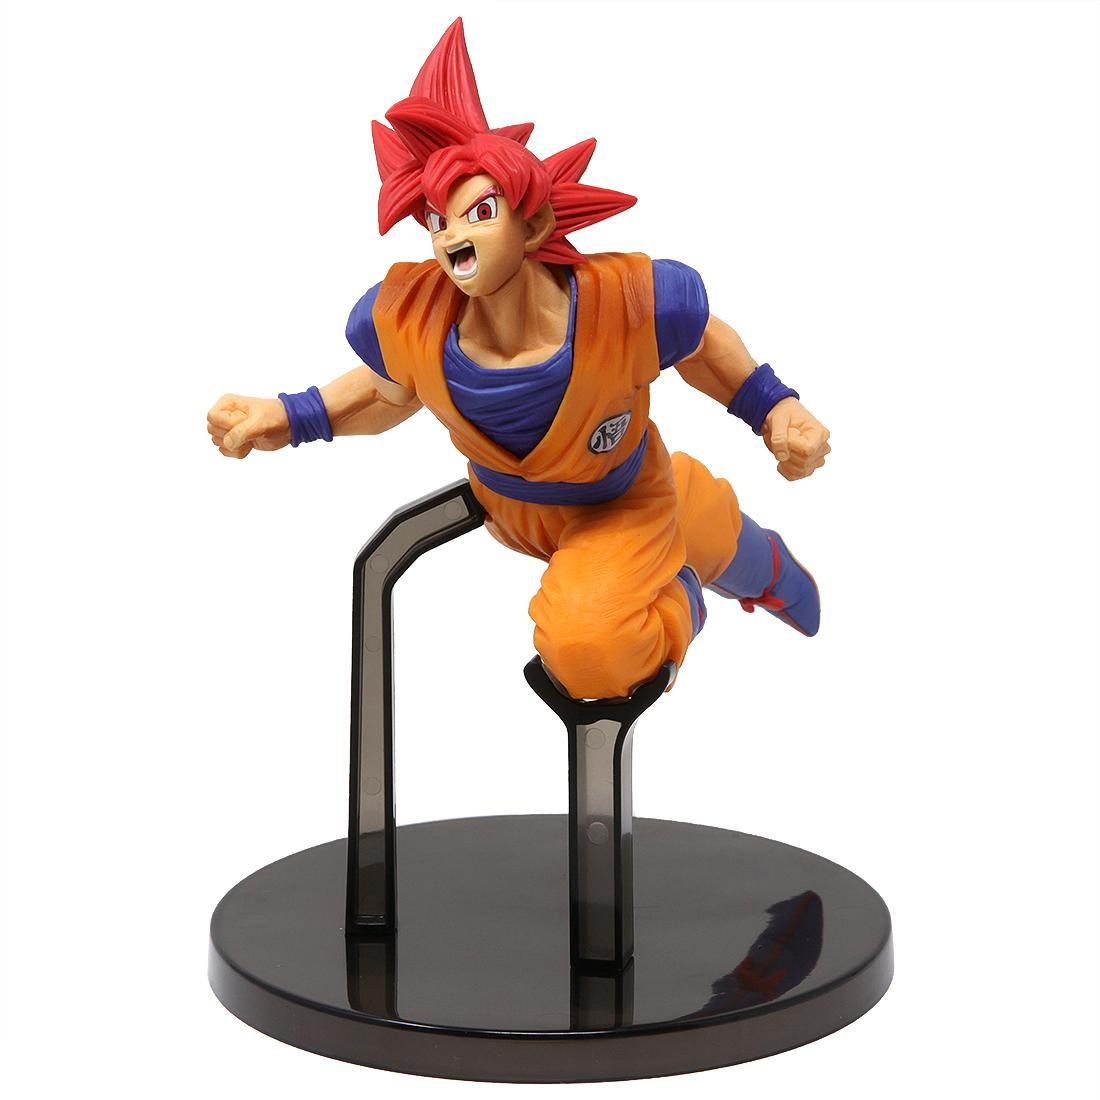 Banpresto Dragon Ball Super Goku Fes!! Vol 9 - Super Saiyan God Goku Figure (orange)